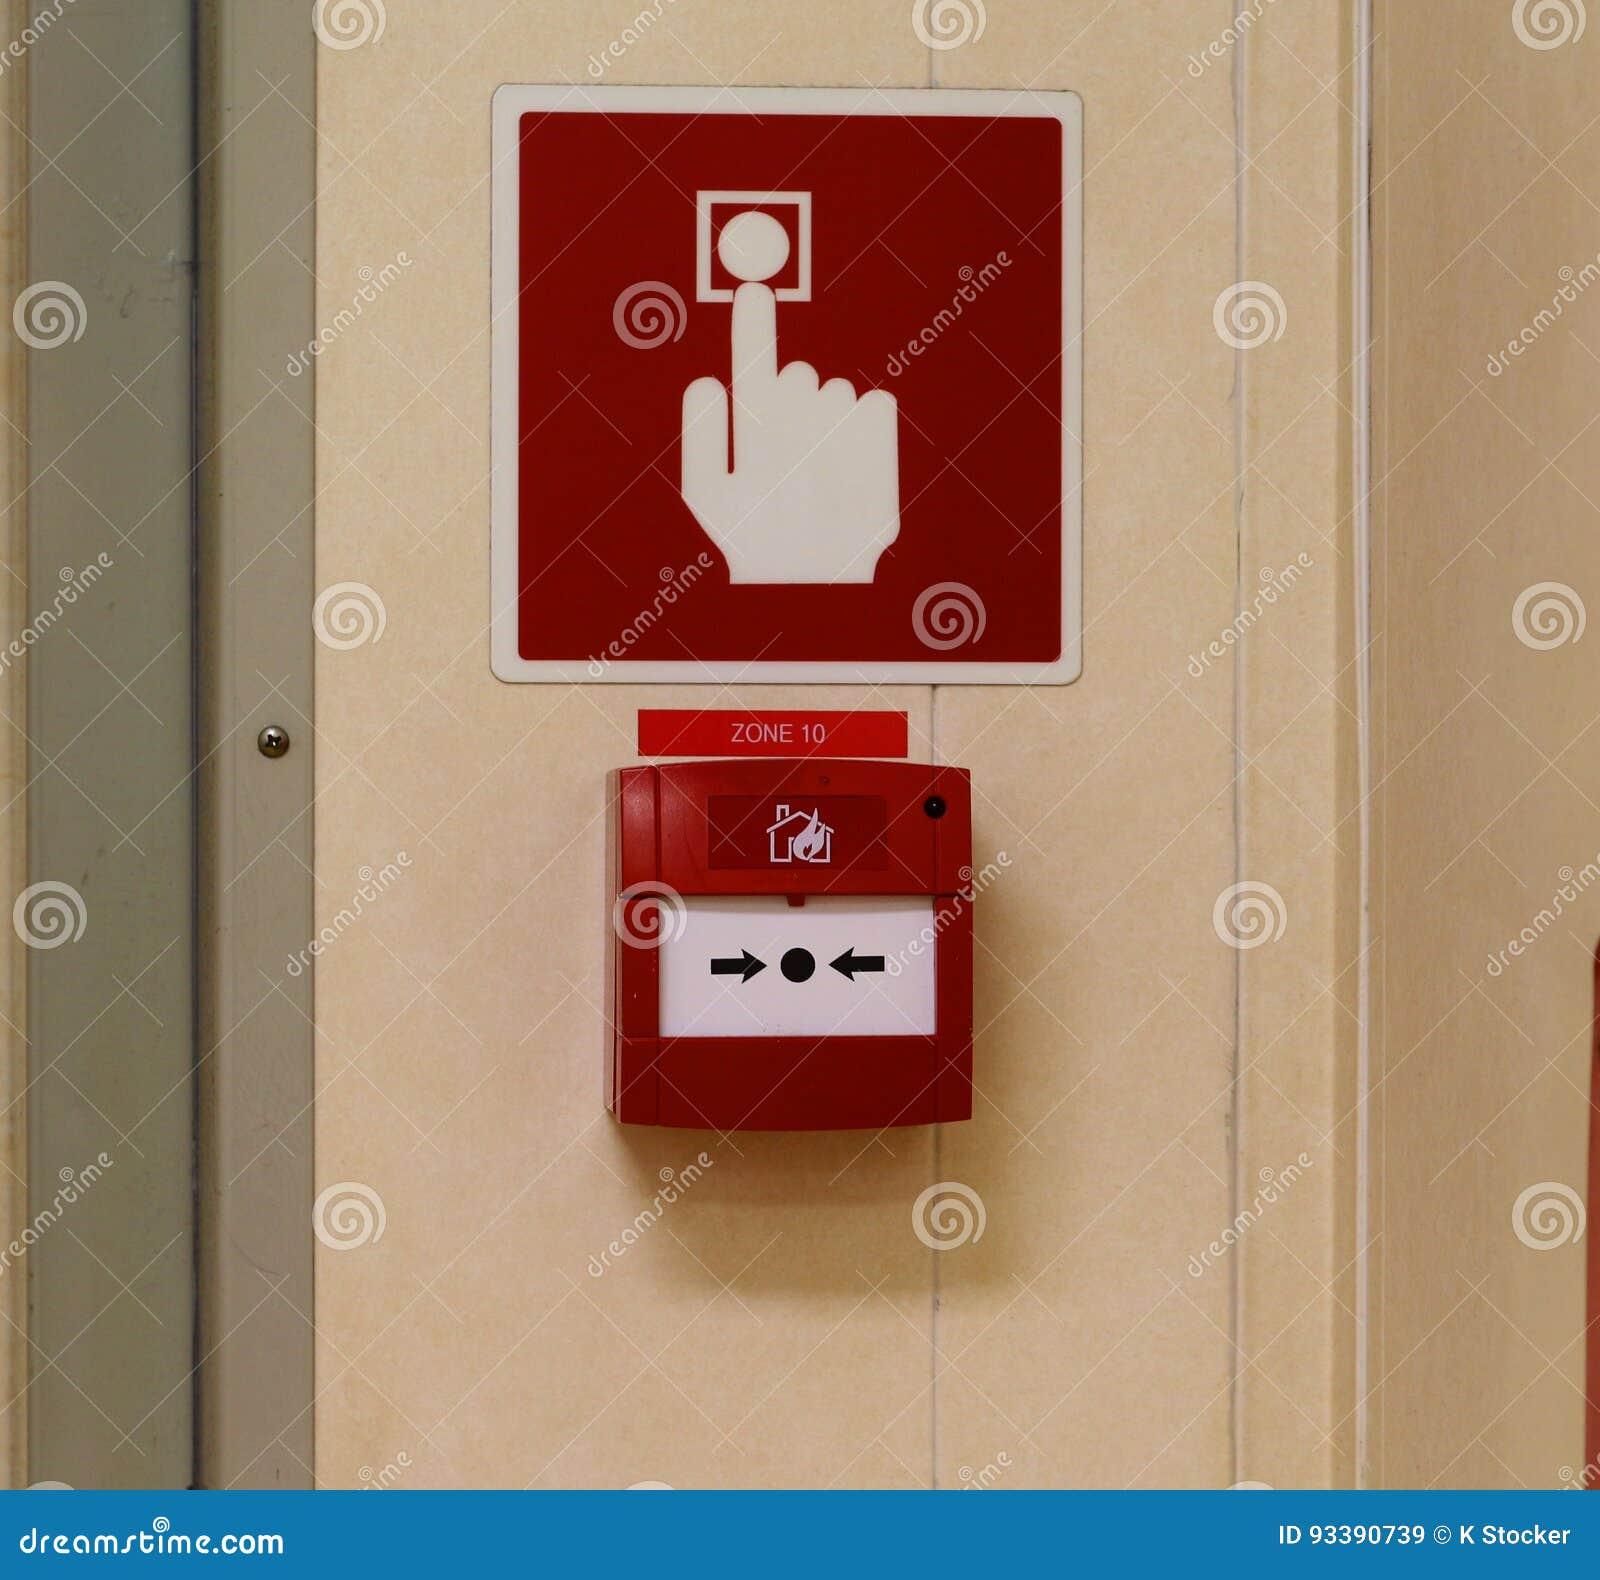 Alarmes de incêndio, teclas da emergência, sinal alertar todos